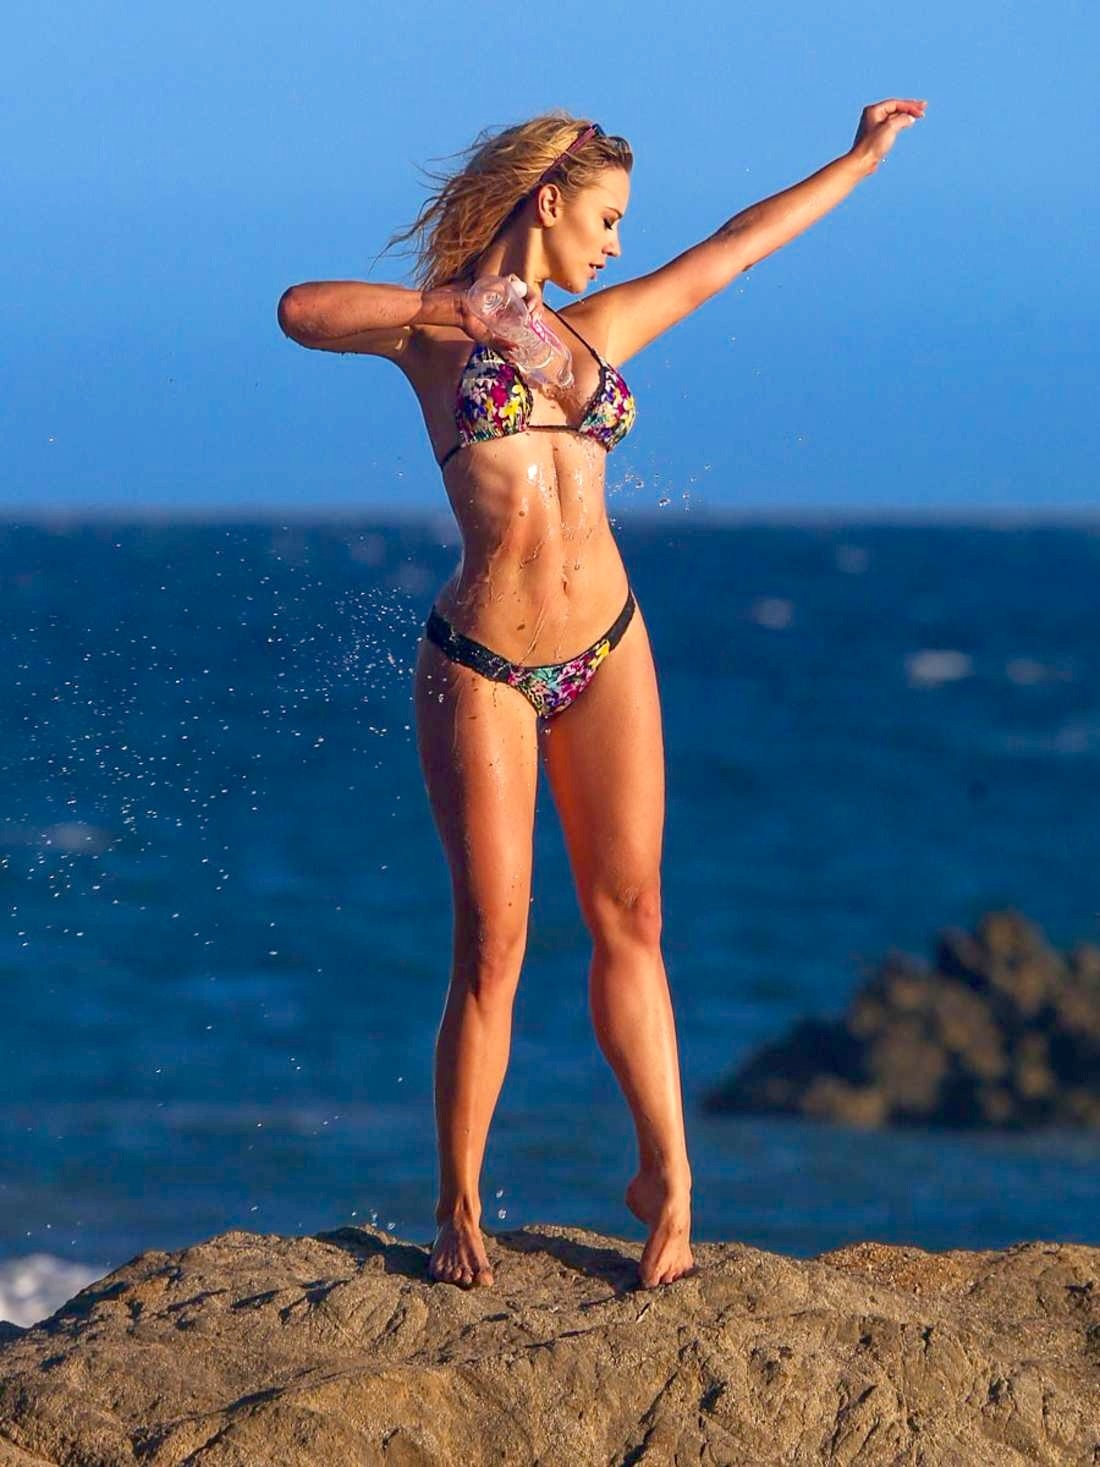 Feet Ava Lange nudes (46 photos), Ass, Paparazzi, Instagram, in bikini 2020